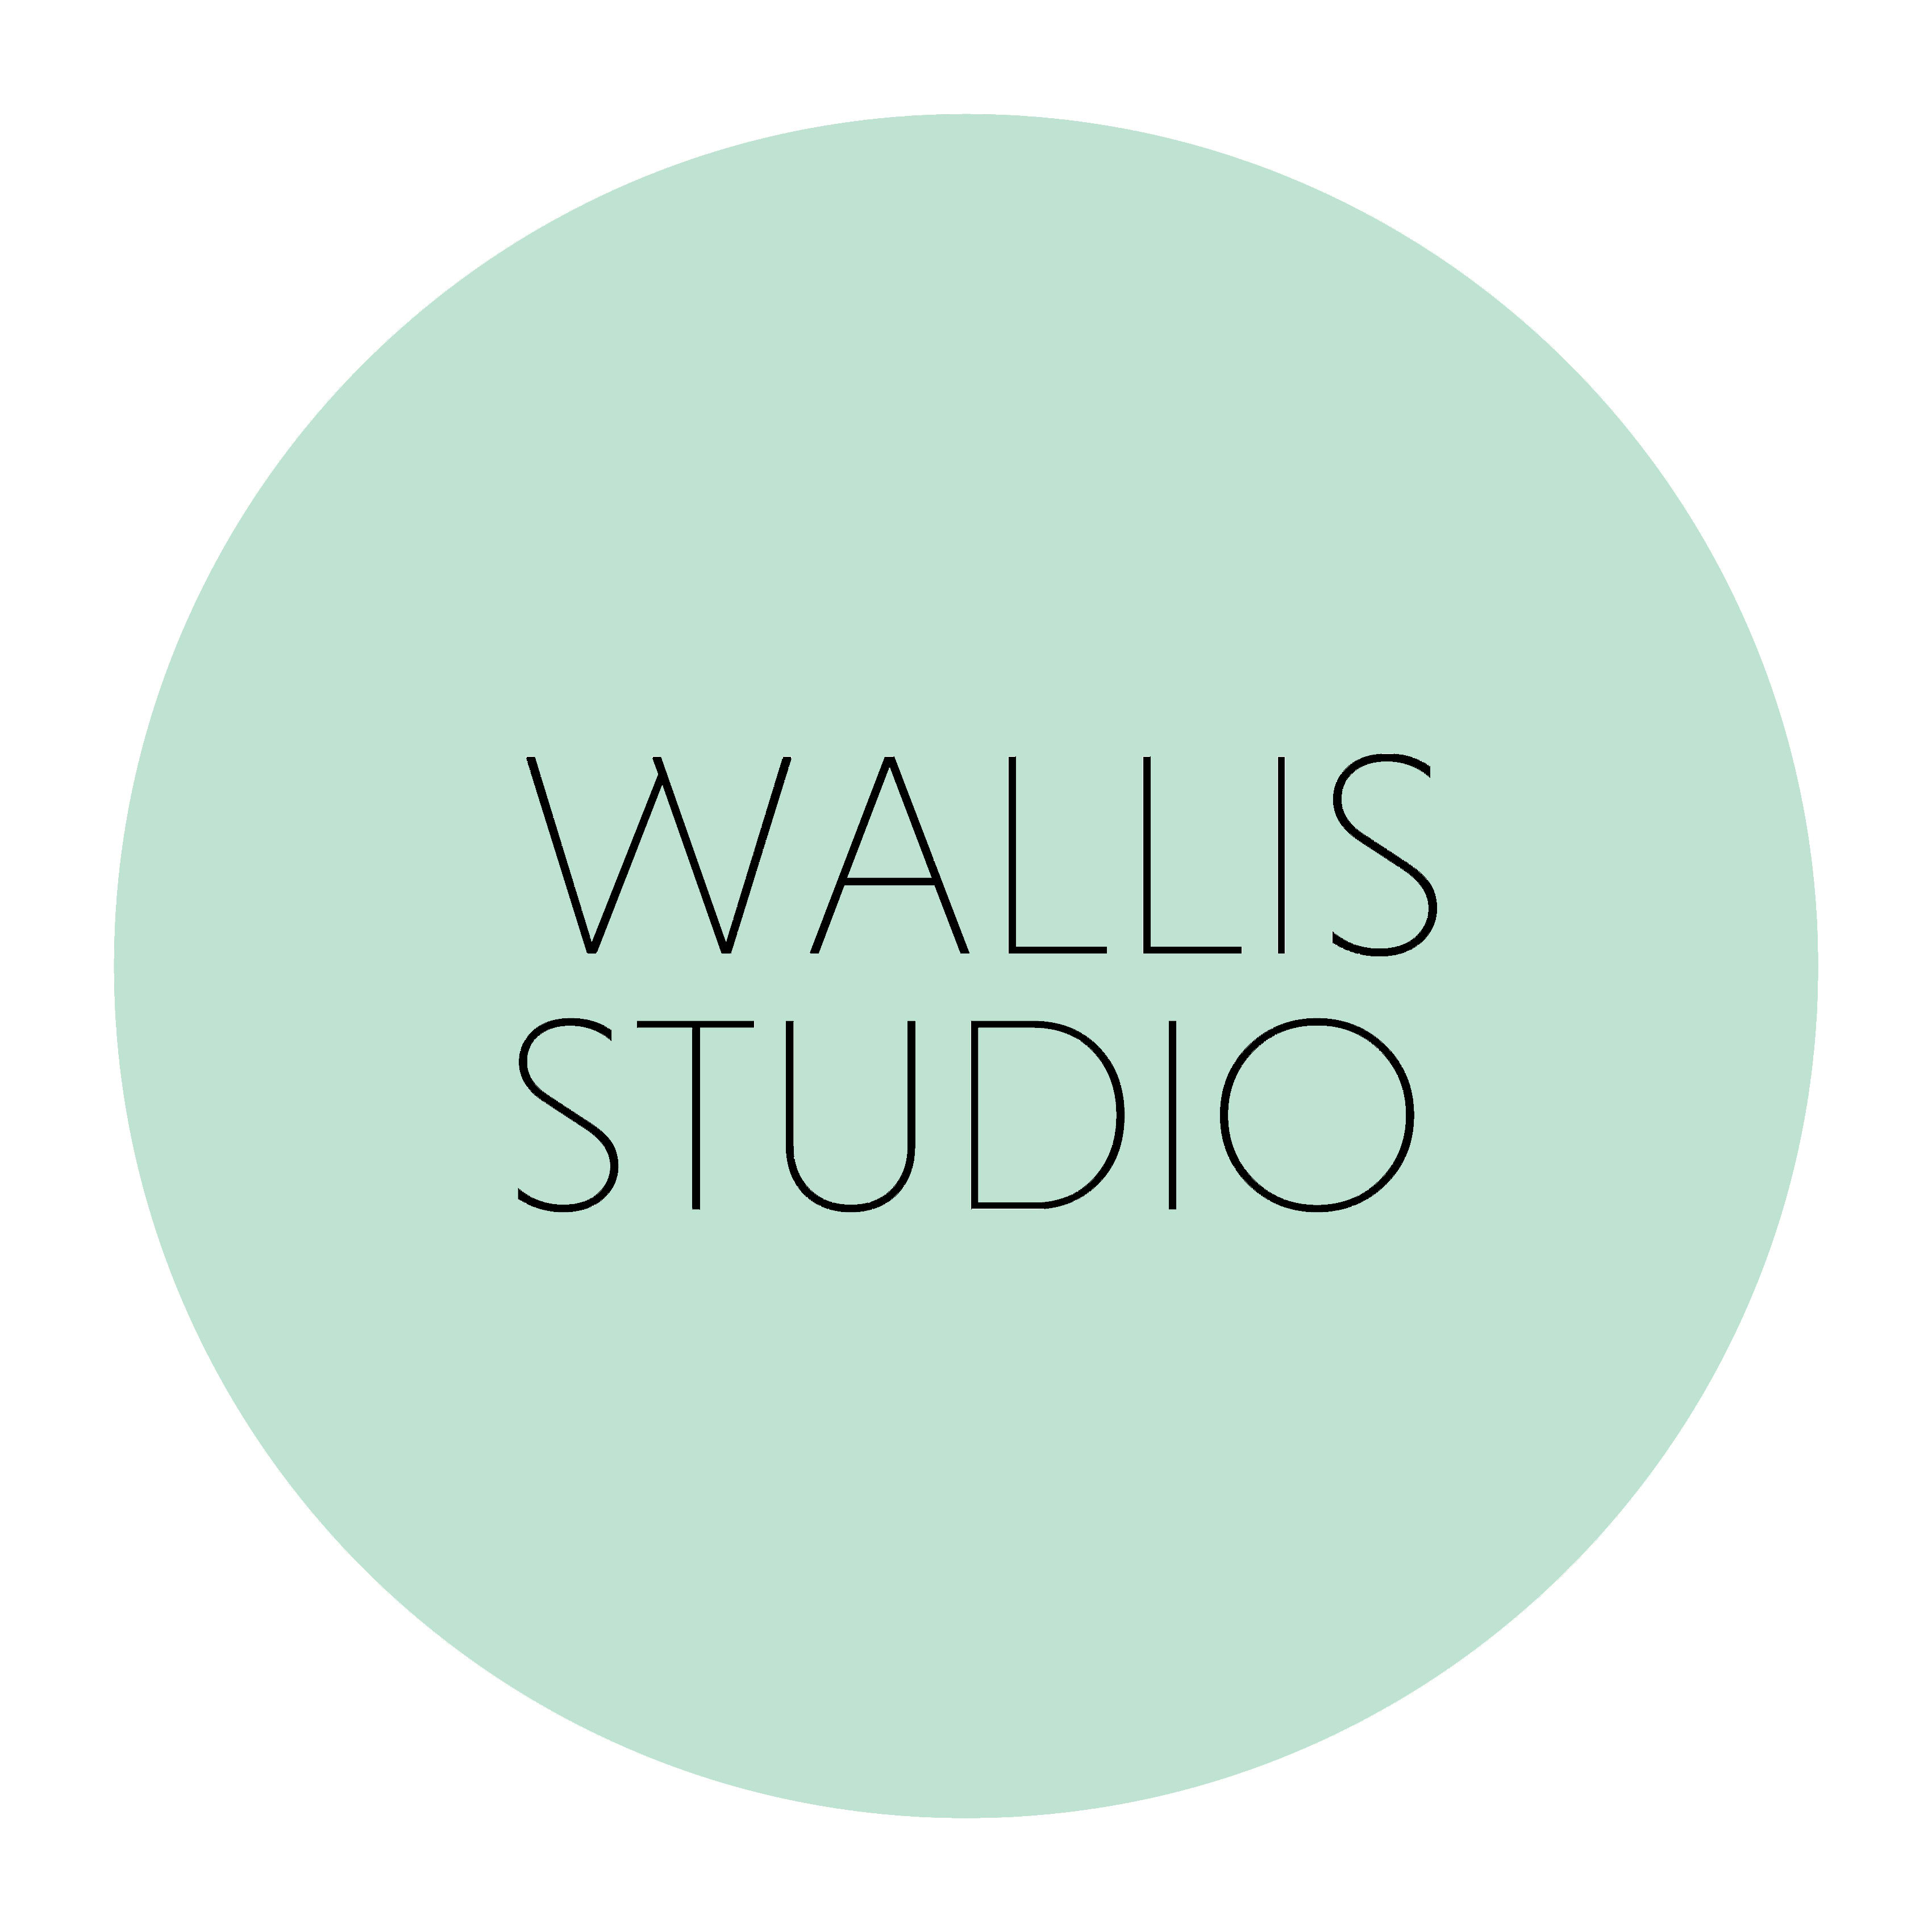 Wallis Studio company logo